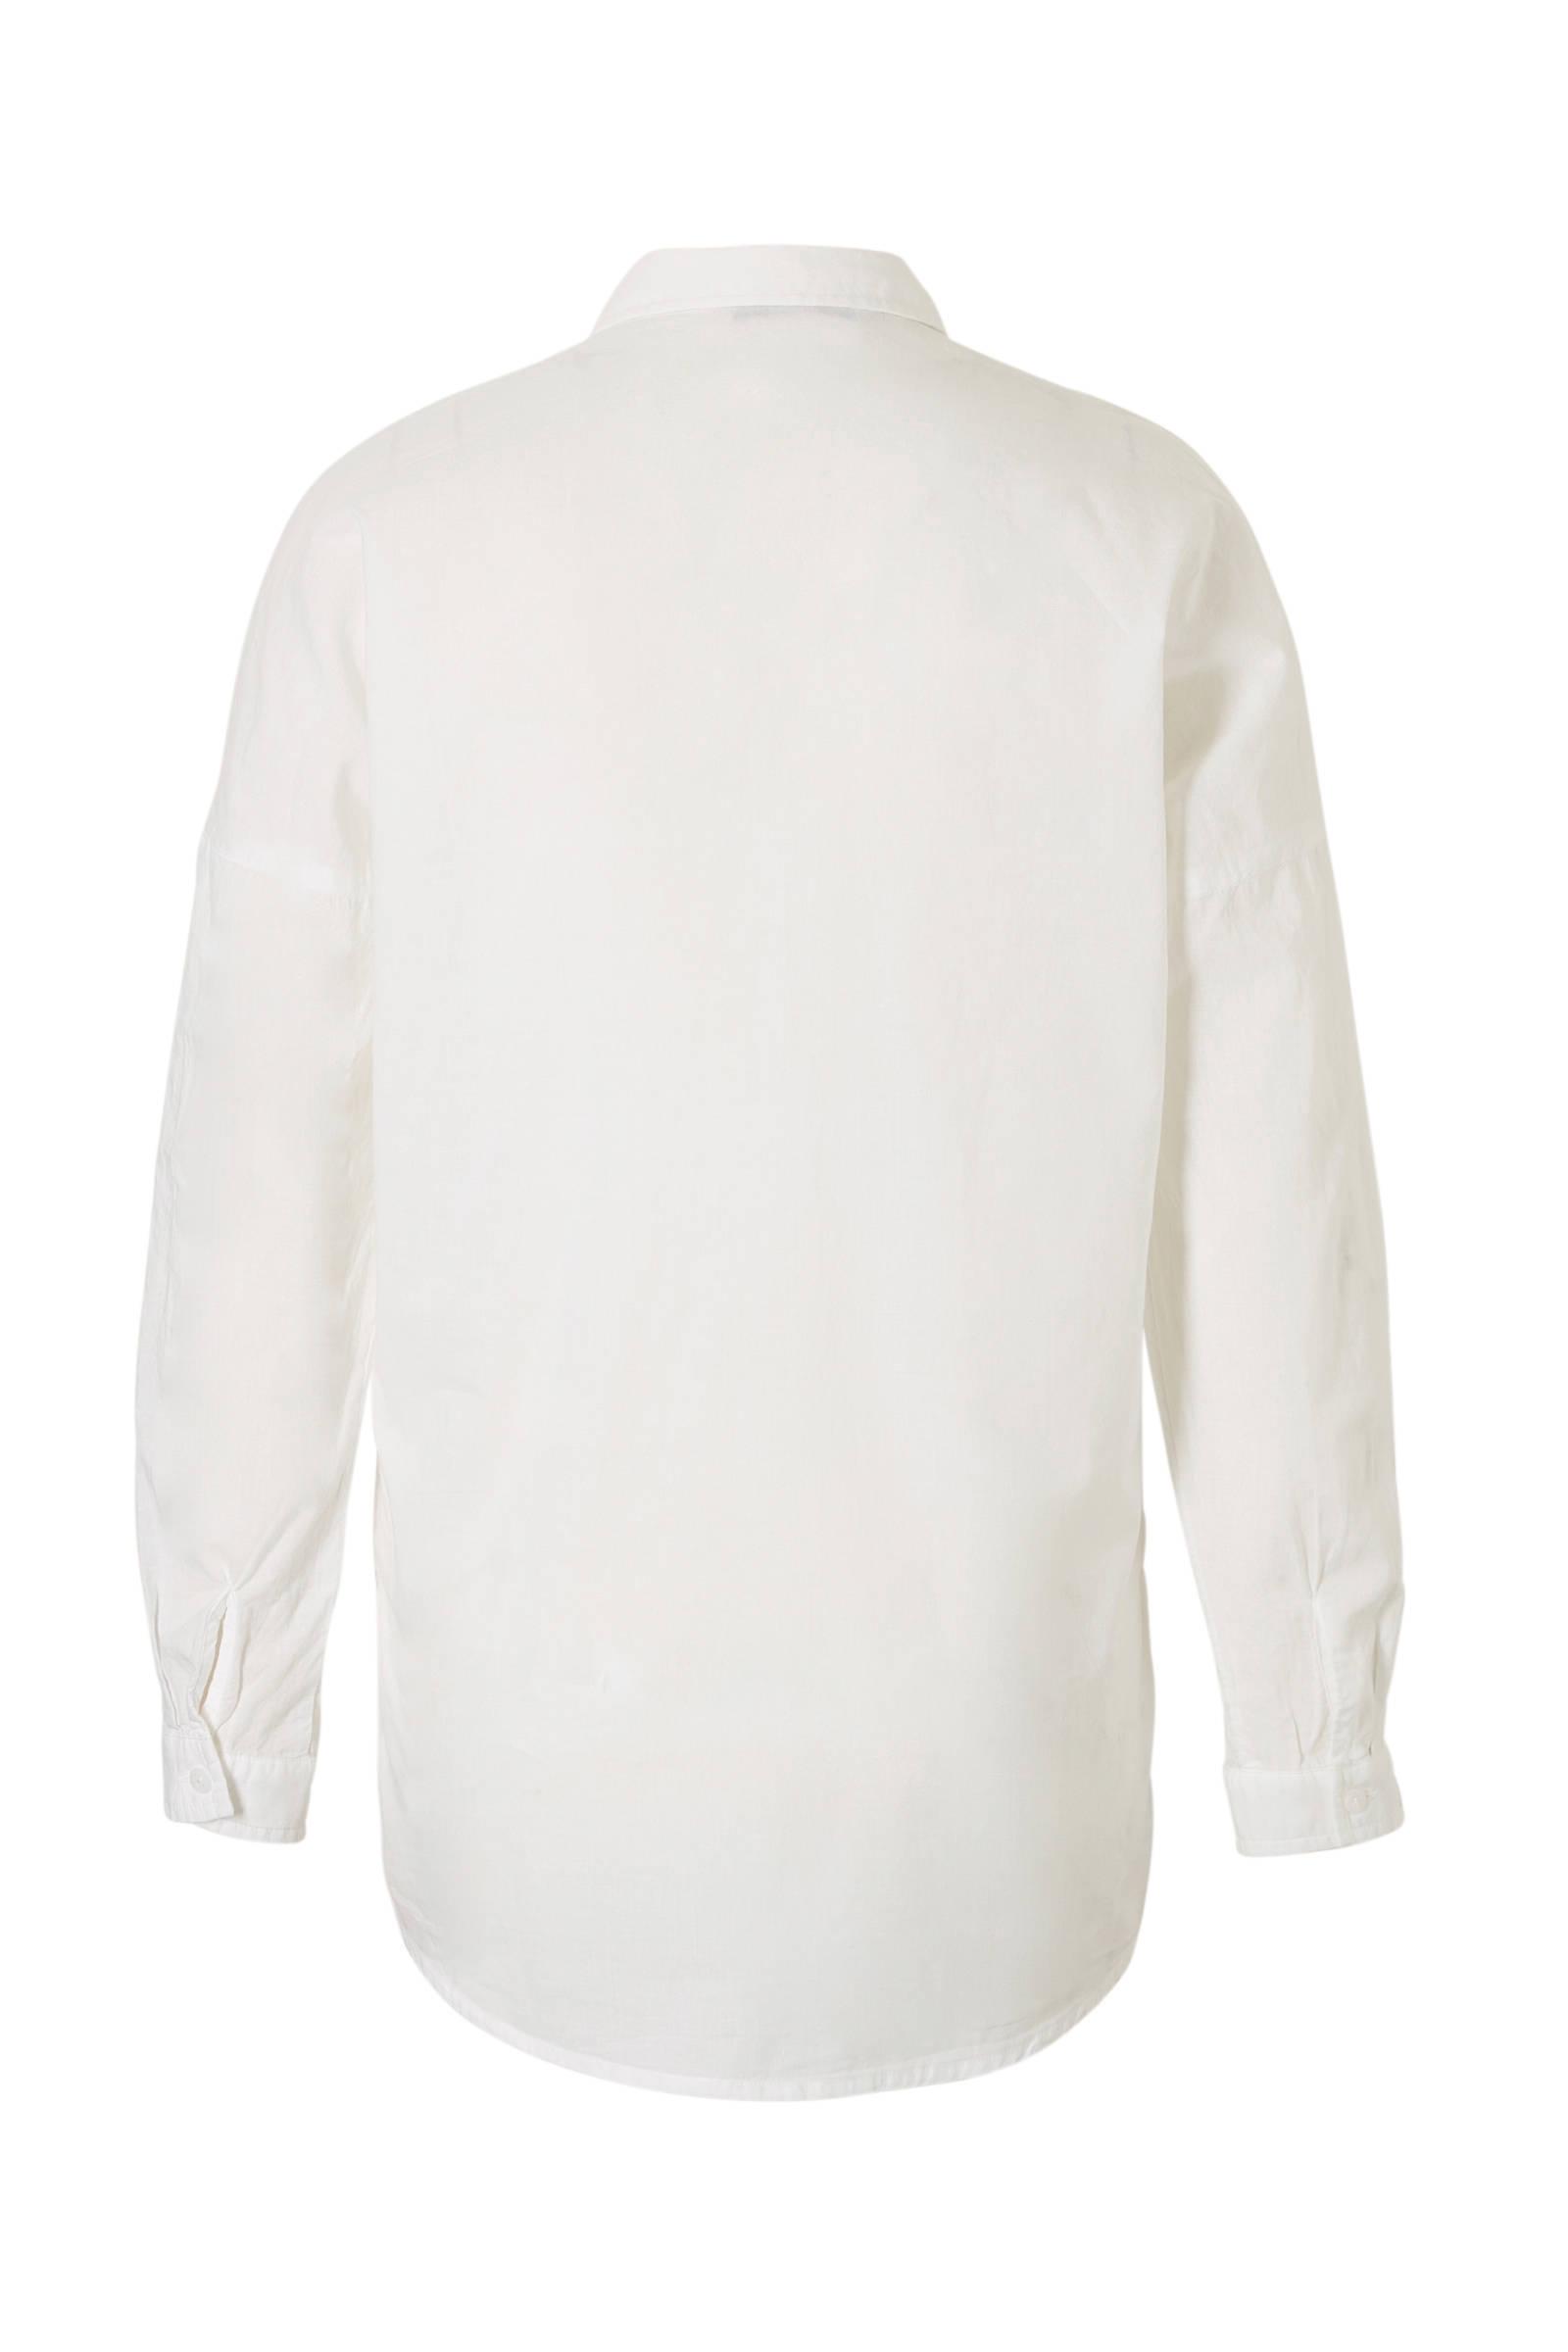 Desigual printopdrik kraaltjes met en blouse 4rx6qnP4